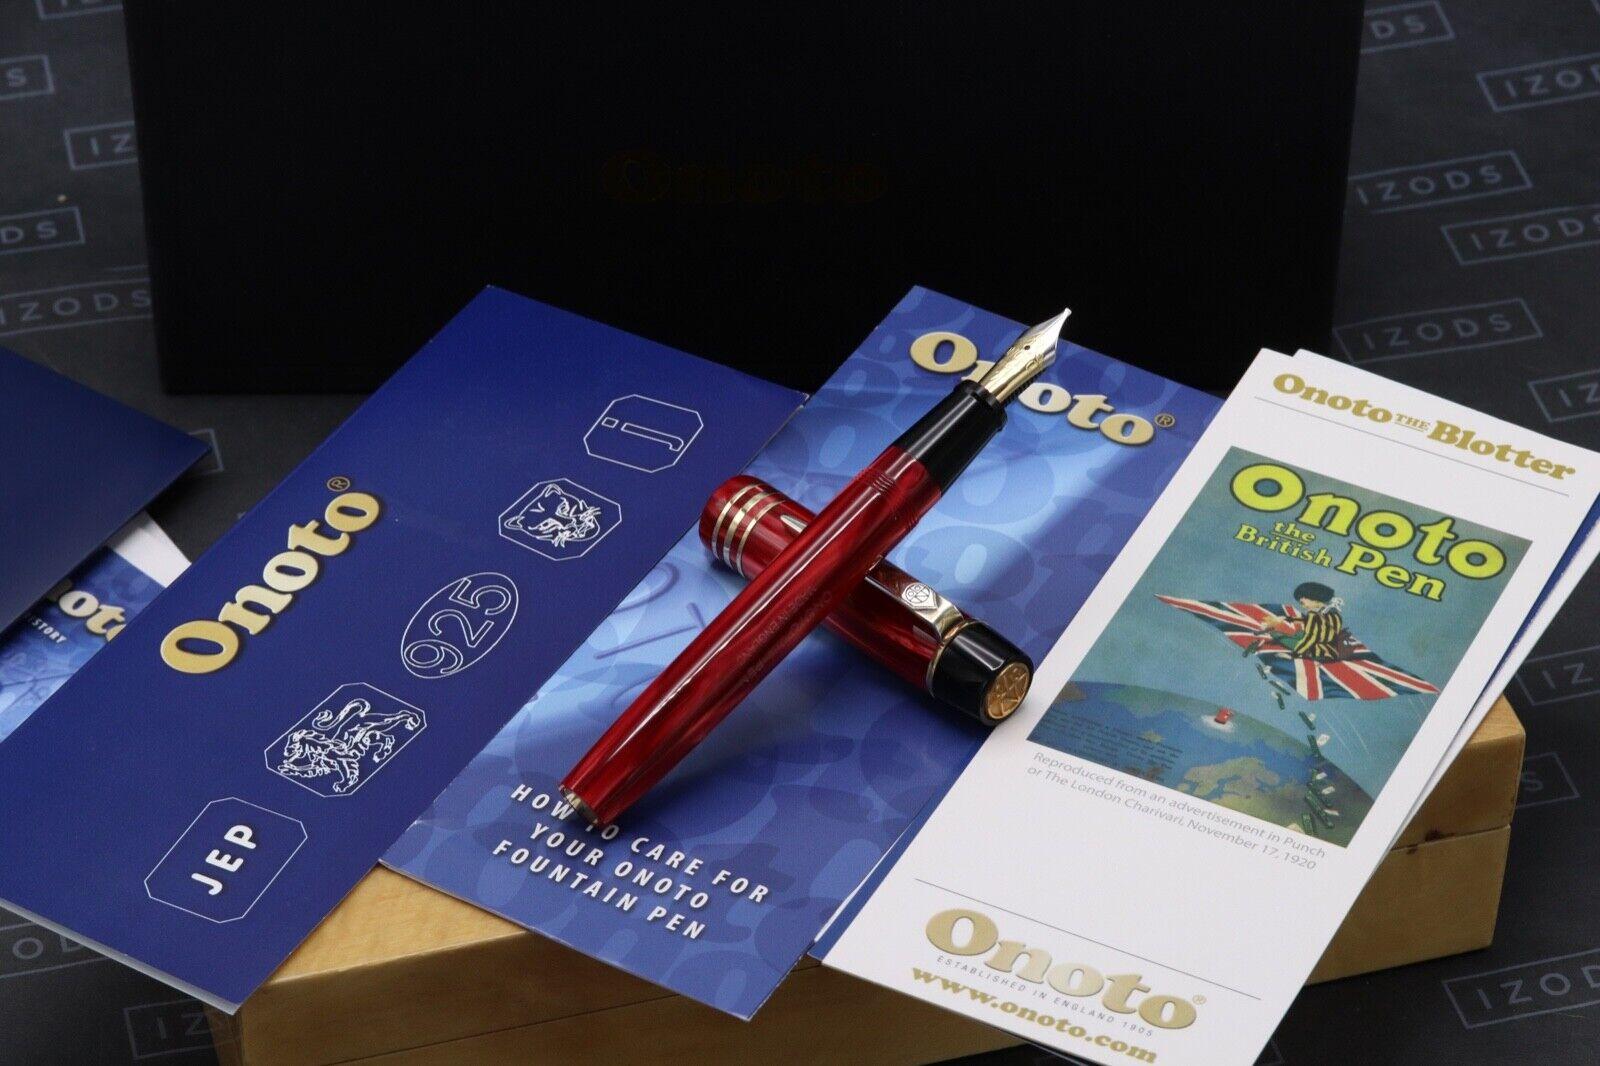 Onoto Magna Classic Burgundy Pearl Fountain Pen